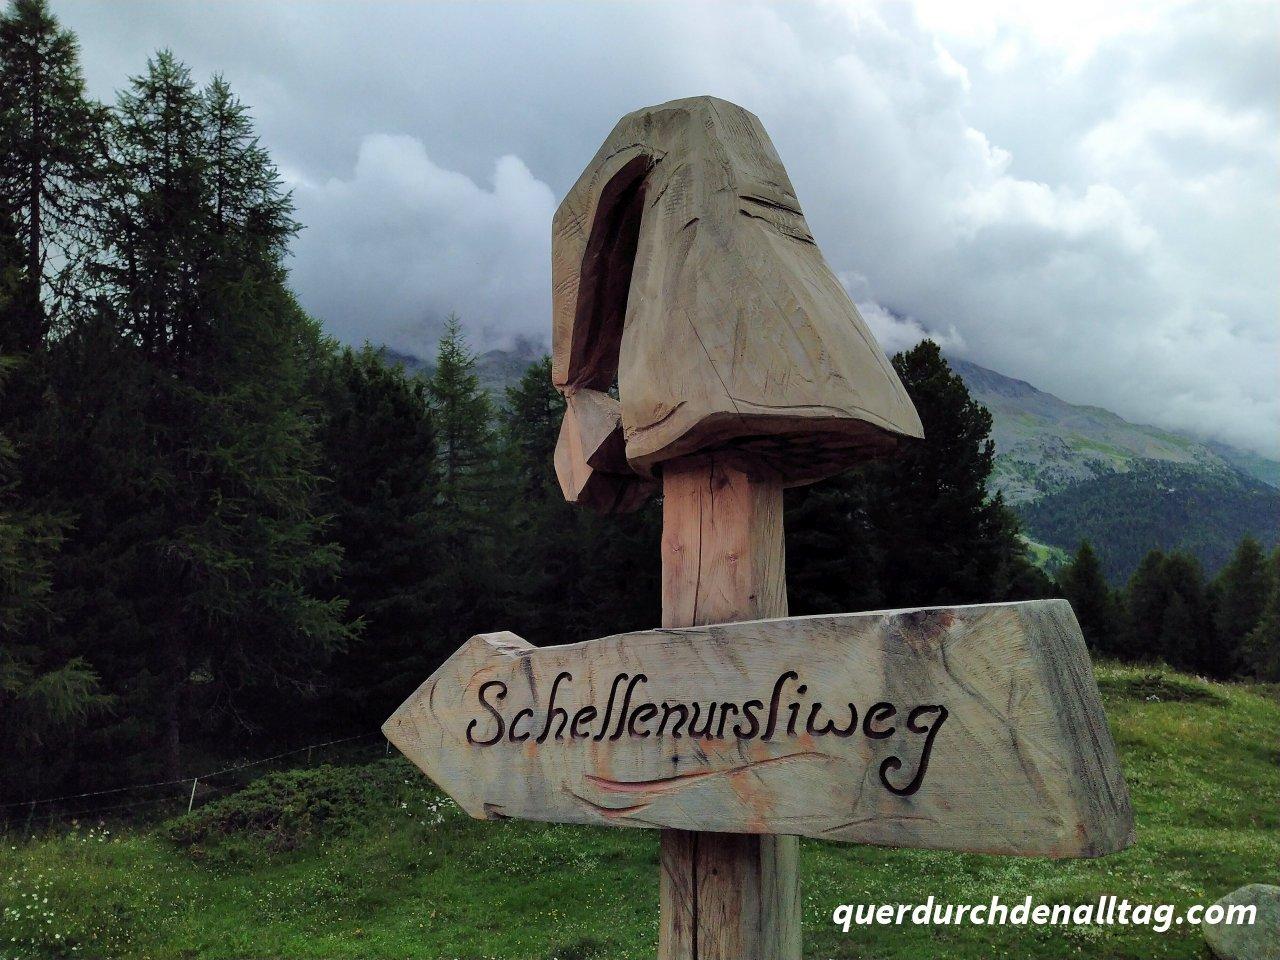 Schellenursliweg St. Moritz